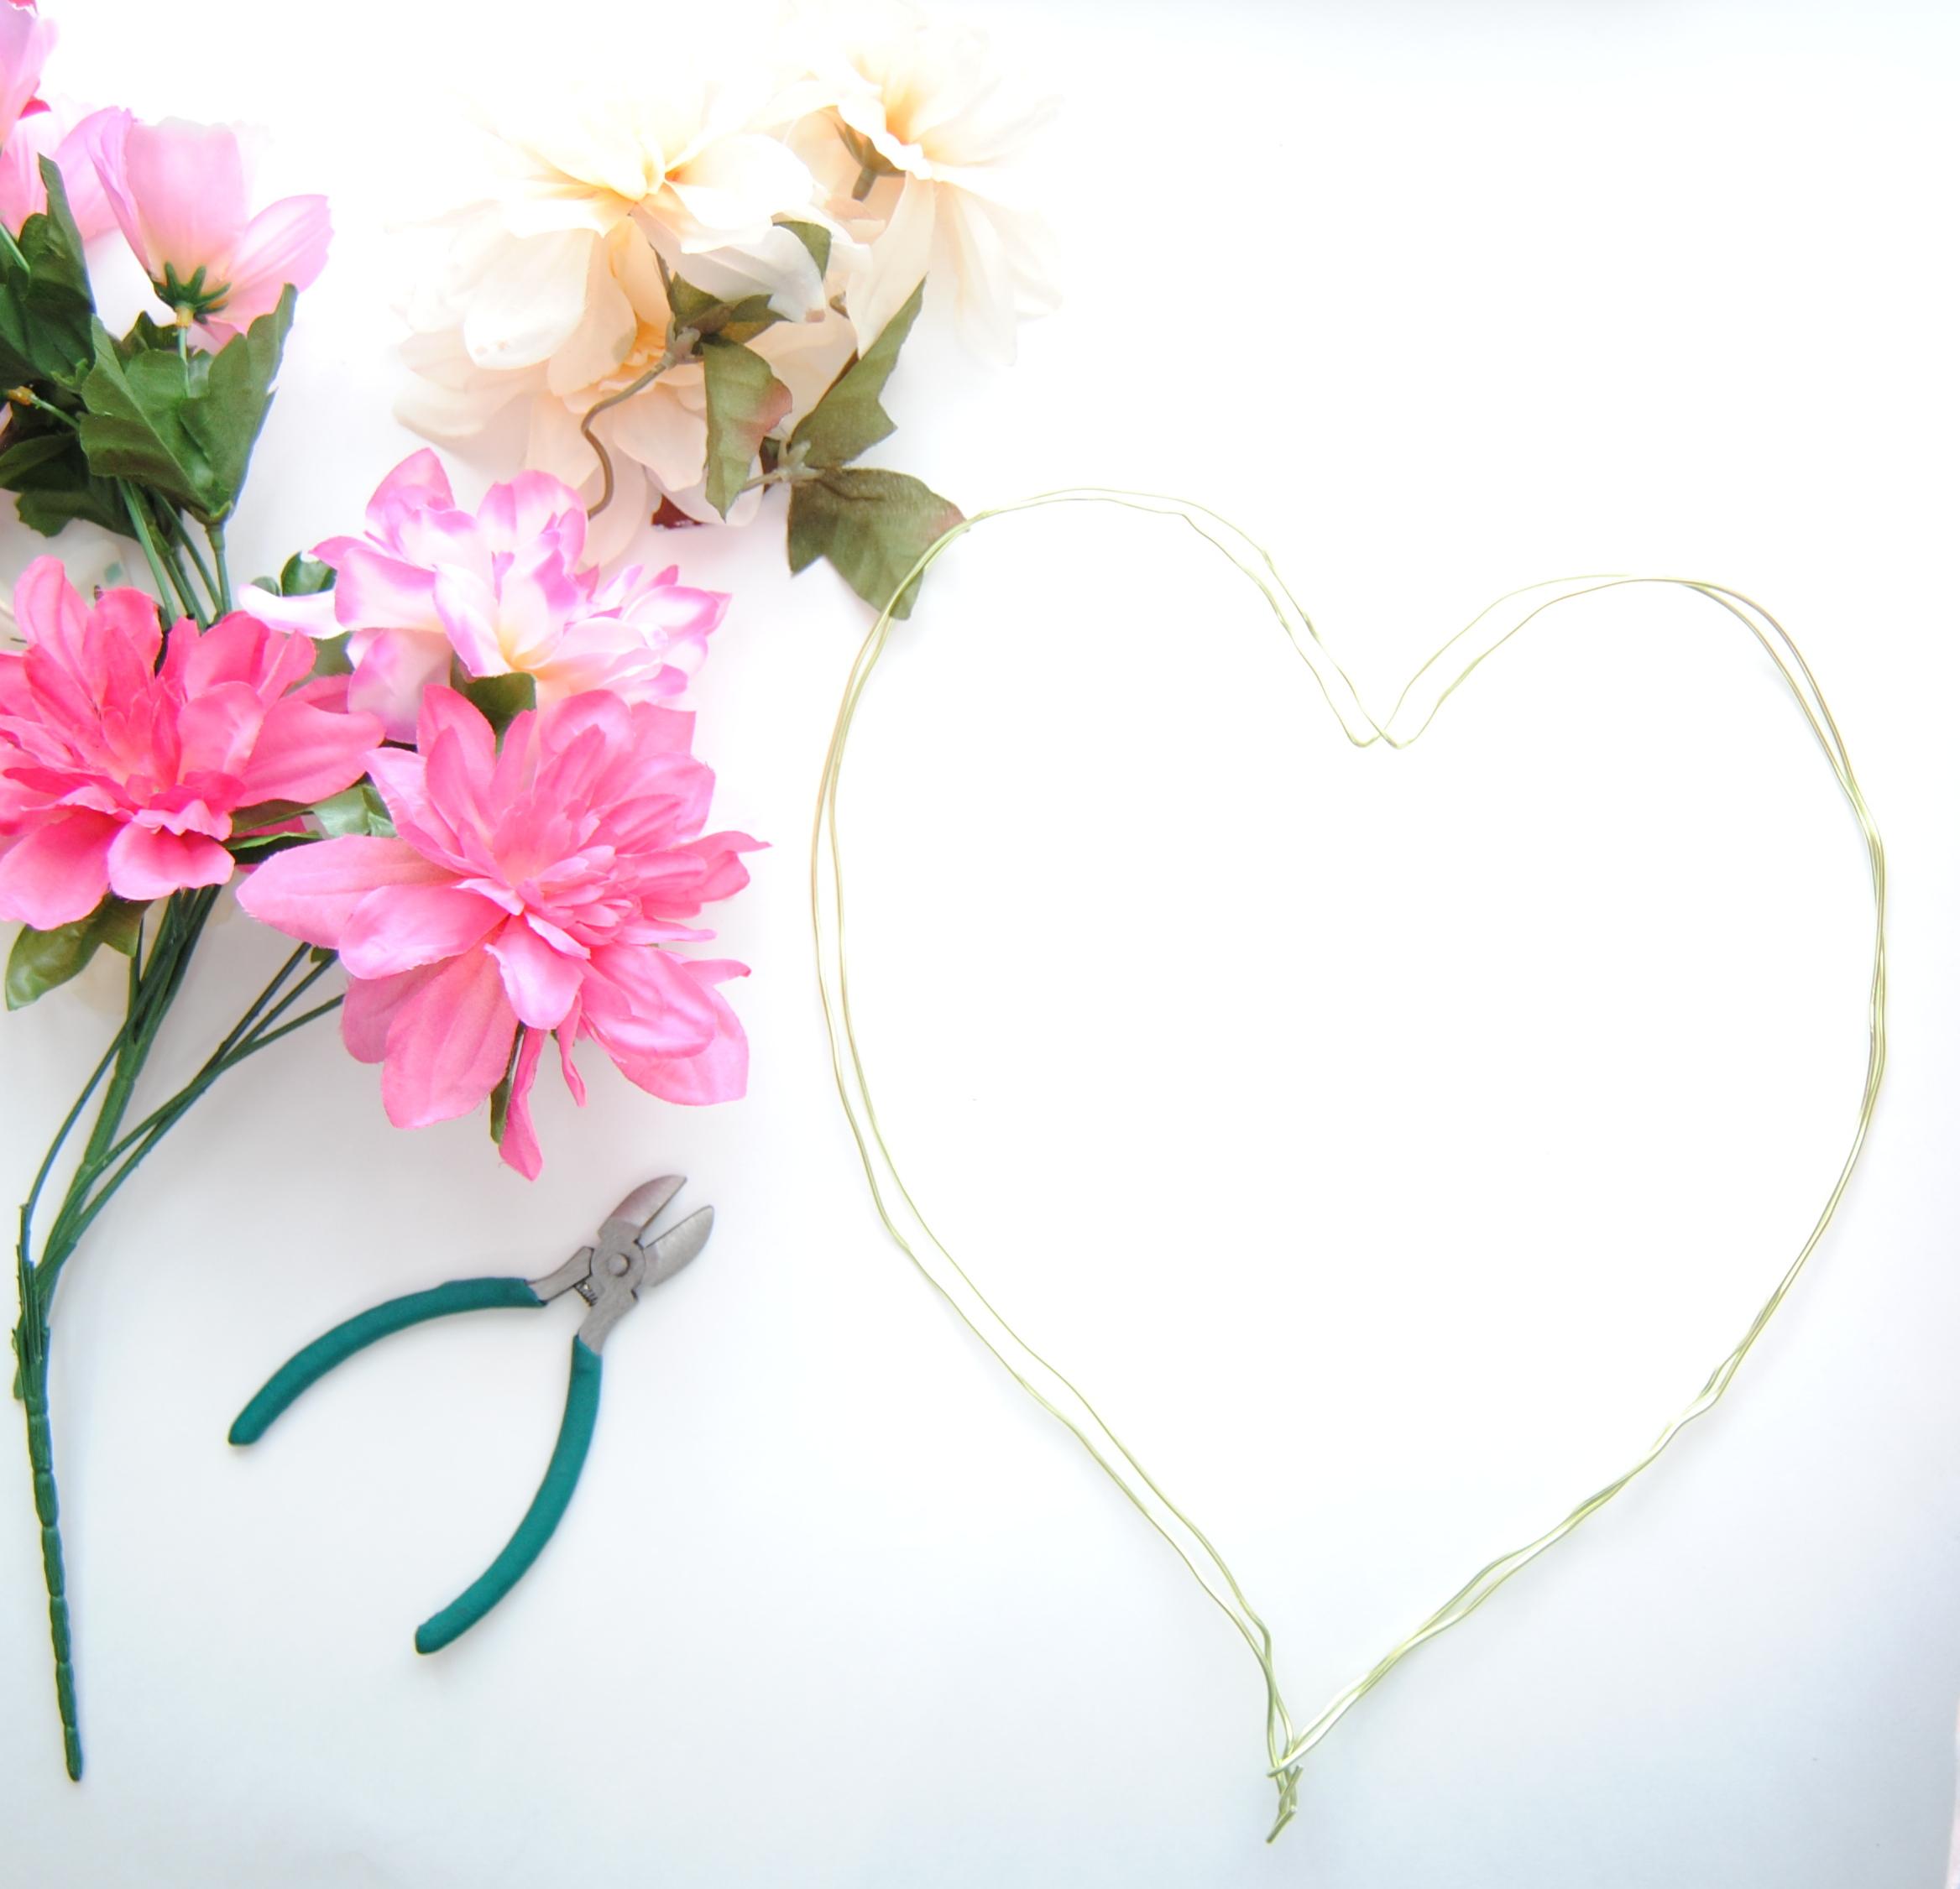 diy-dollar-heart-wreath